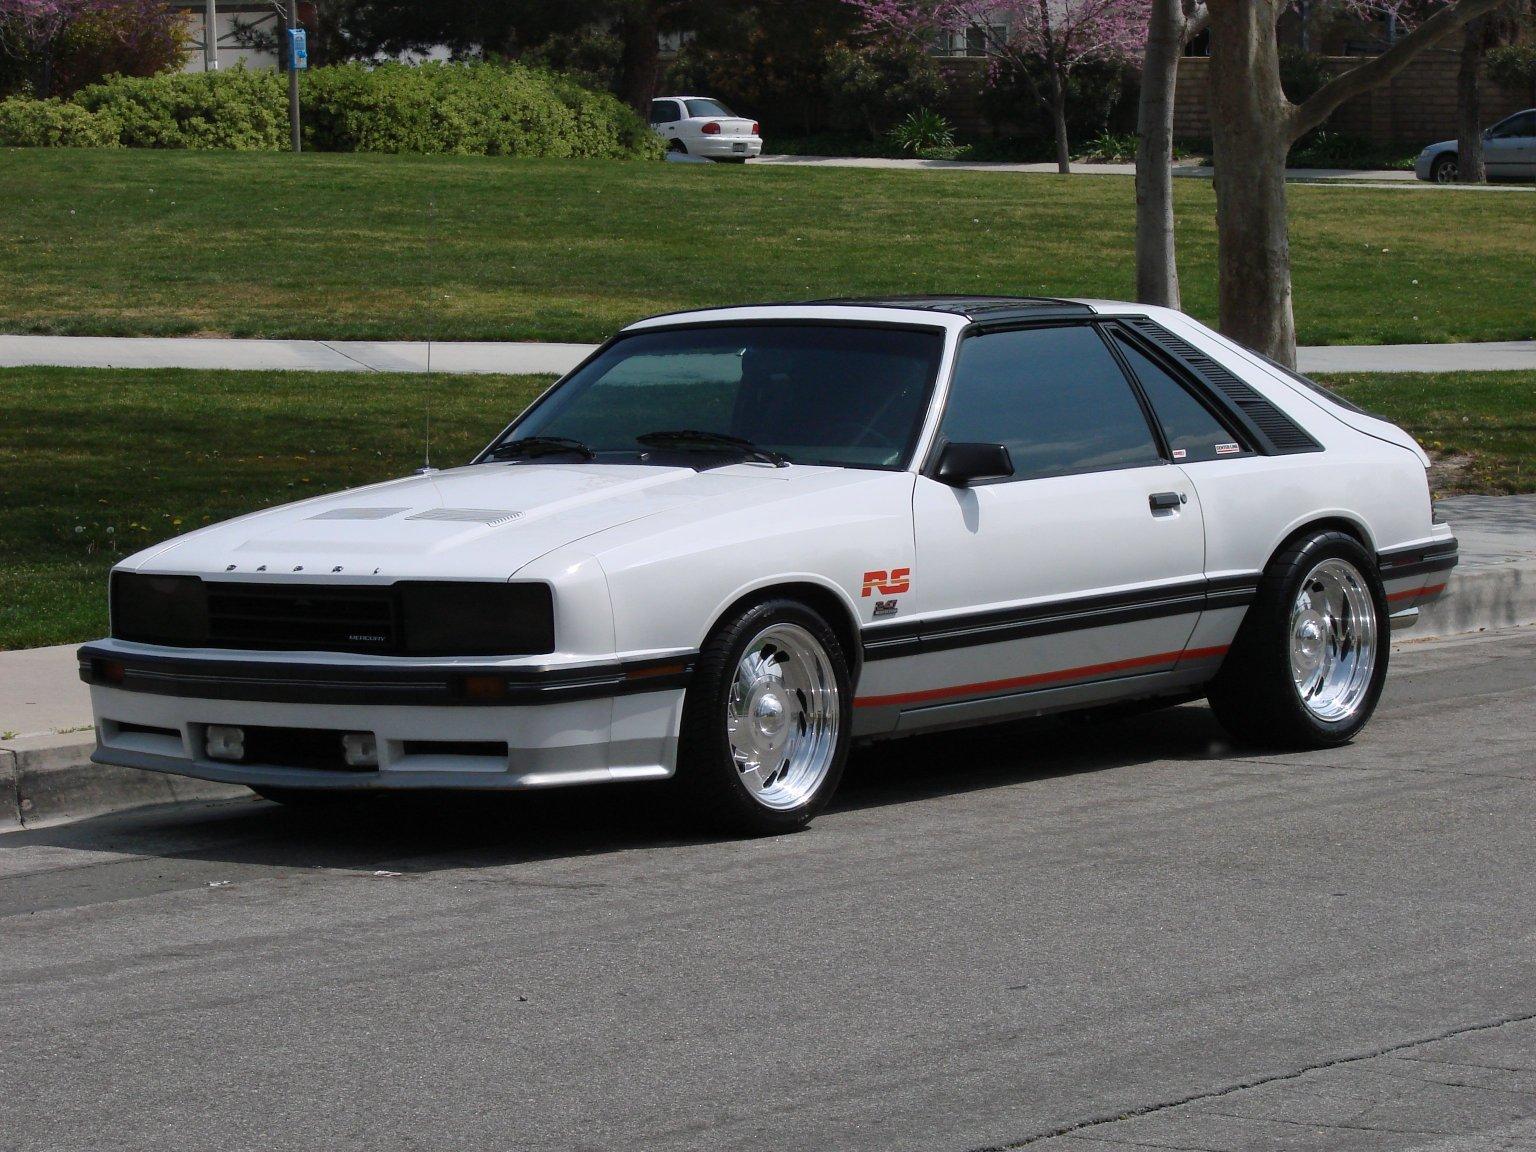 The Rare Fox Mercury Capri Love Em Ford Mustang Forum 1983 Wiring Diagram Click Image For Larger Version Name Capri1 Views 13896 Size 3572